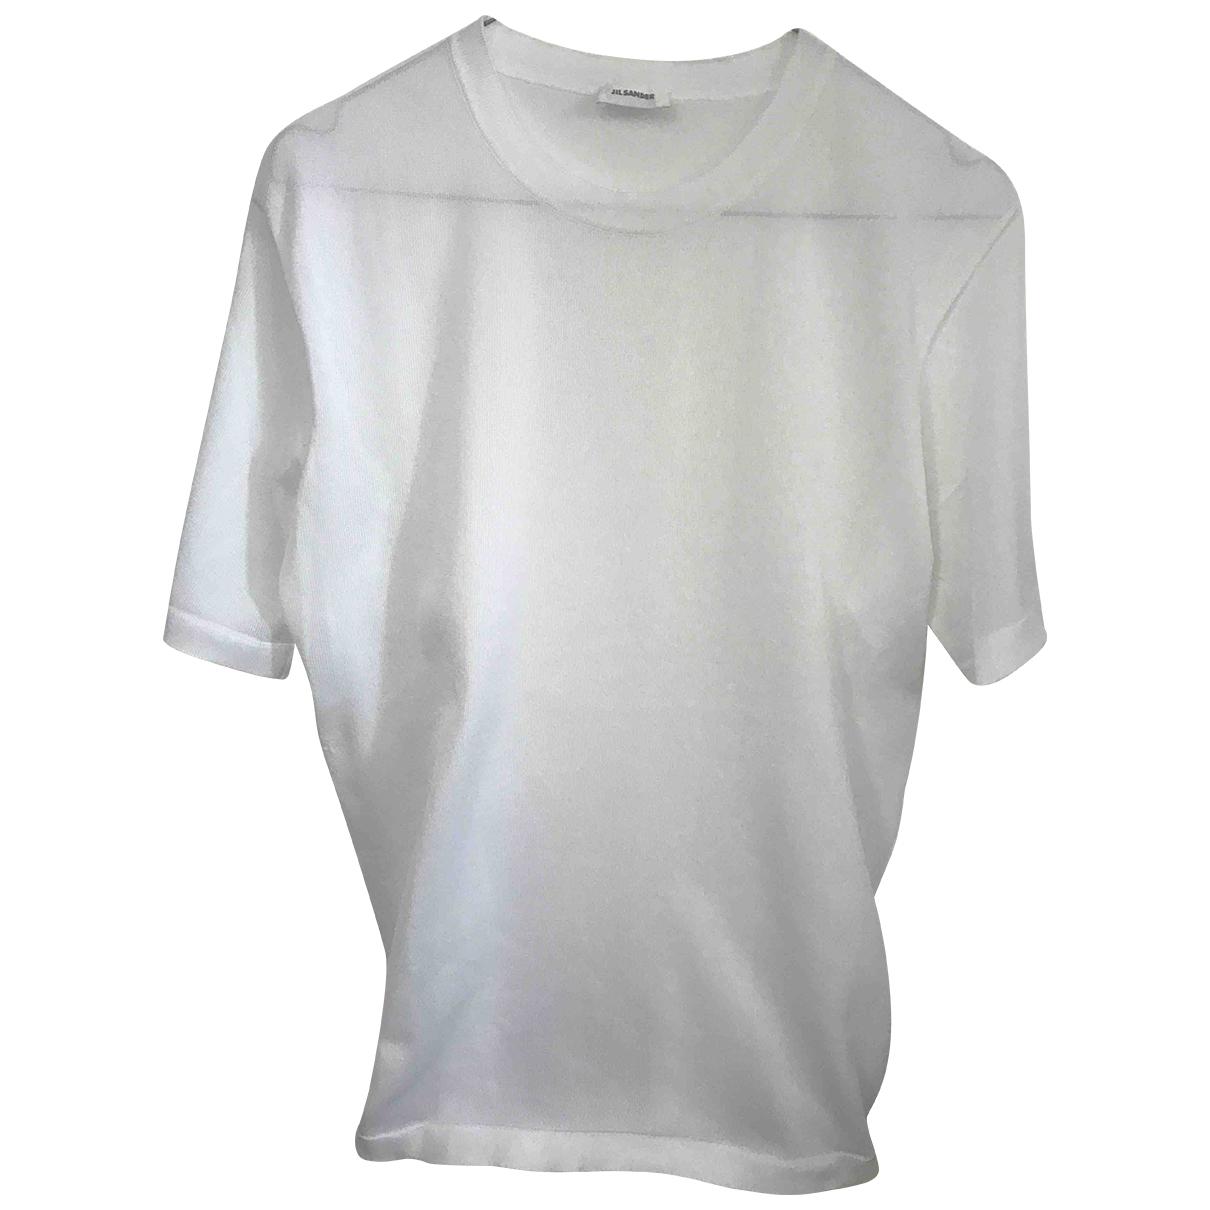 Jil Sander - Tee shirts   pour homme - blanc